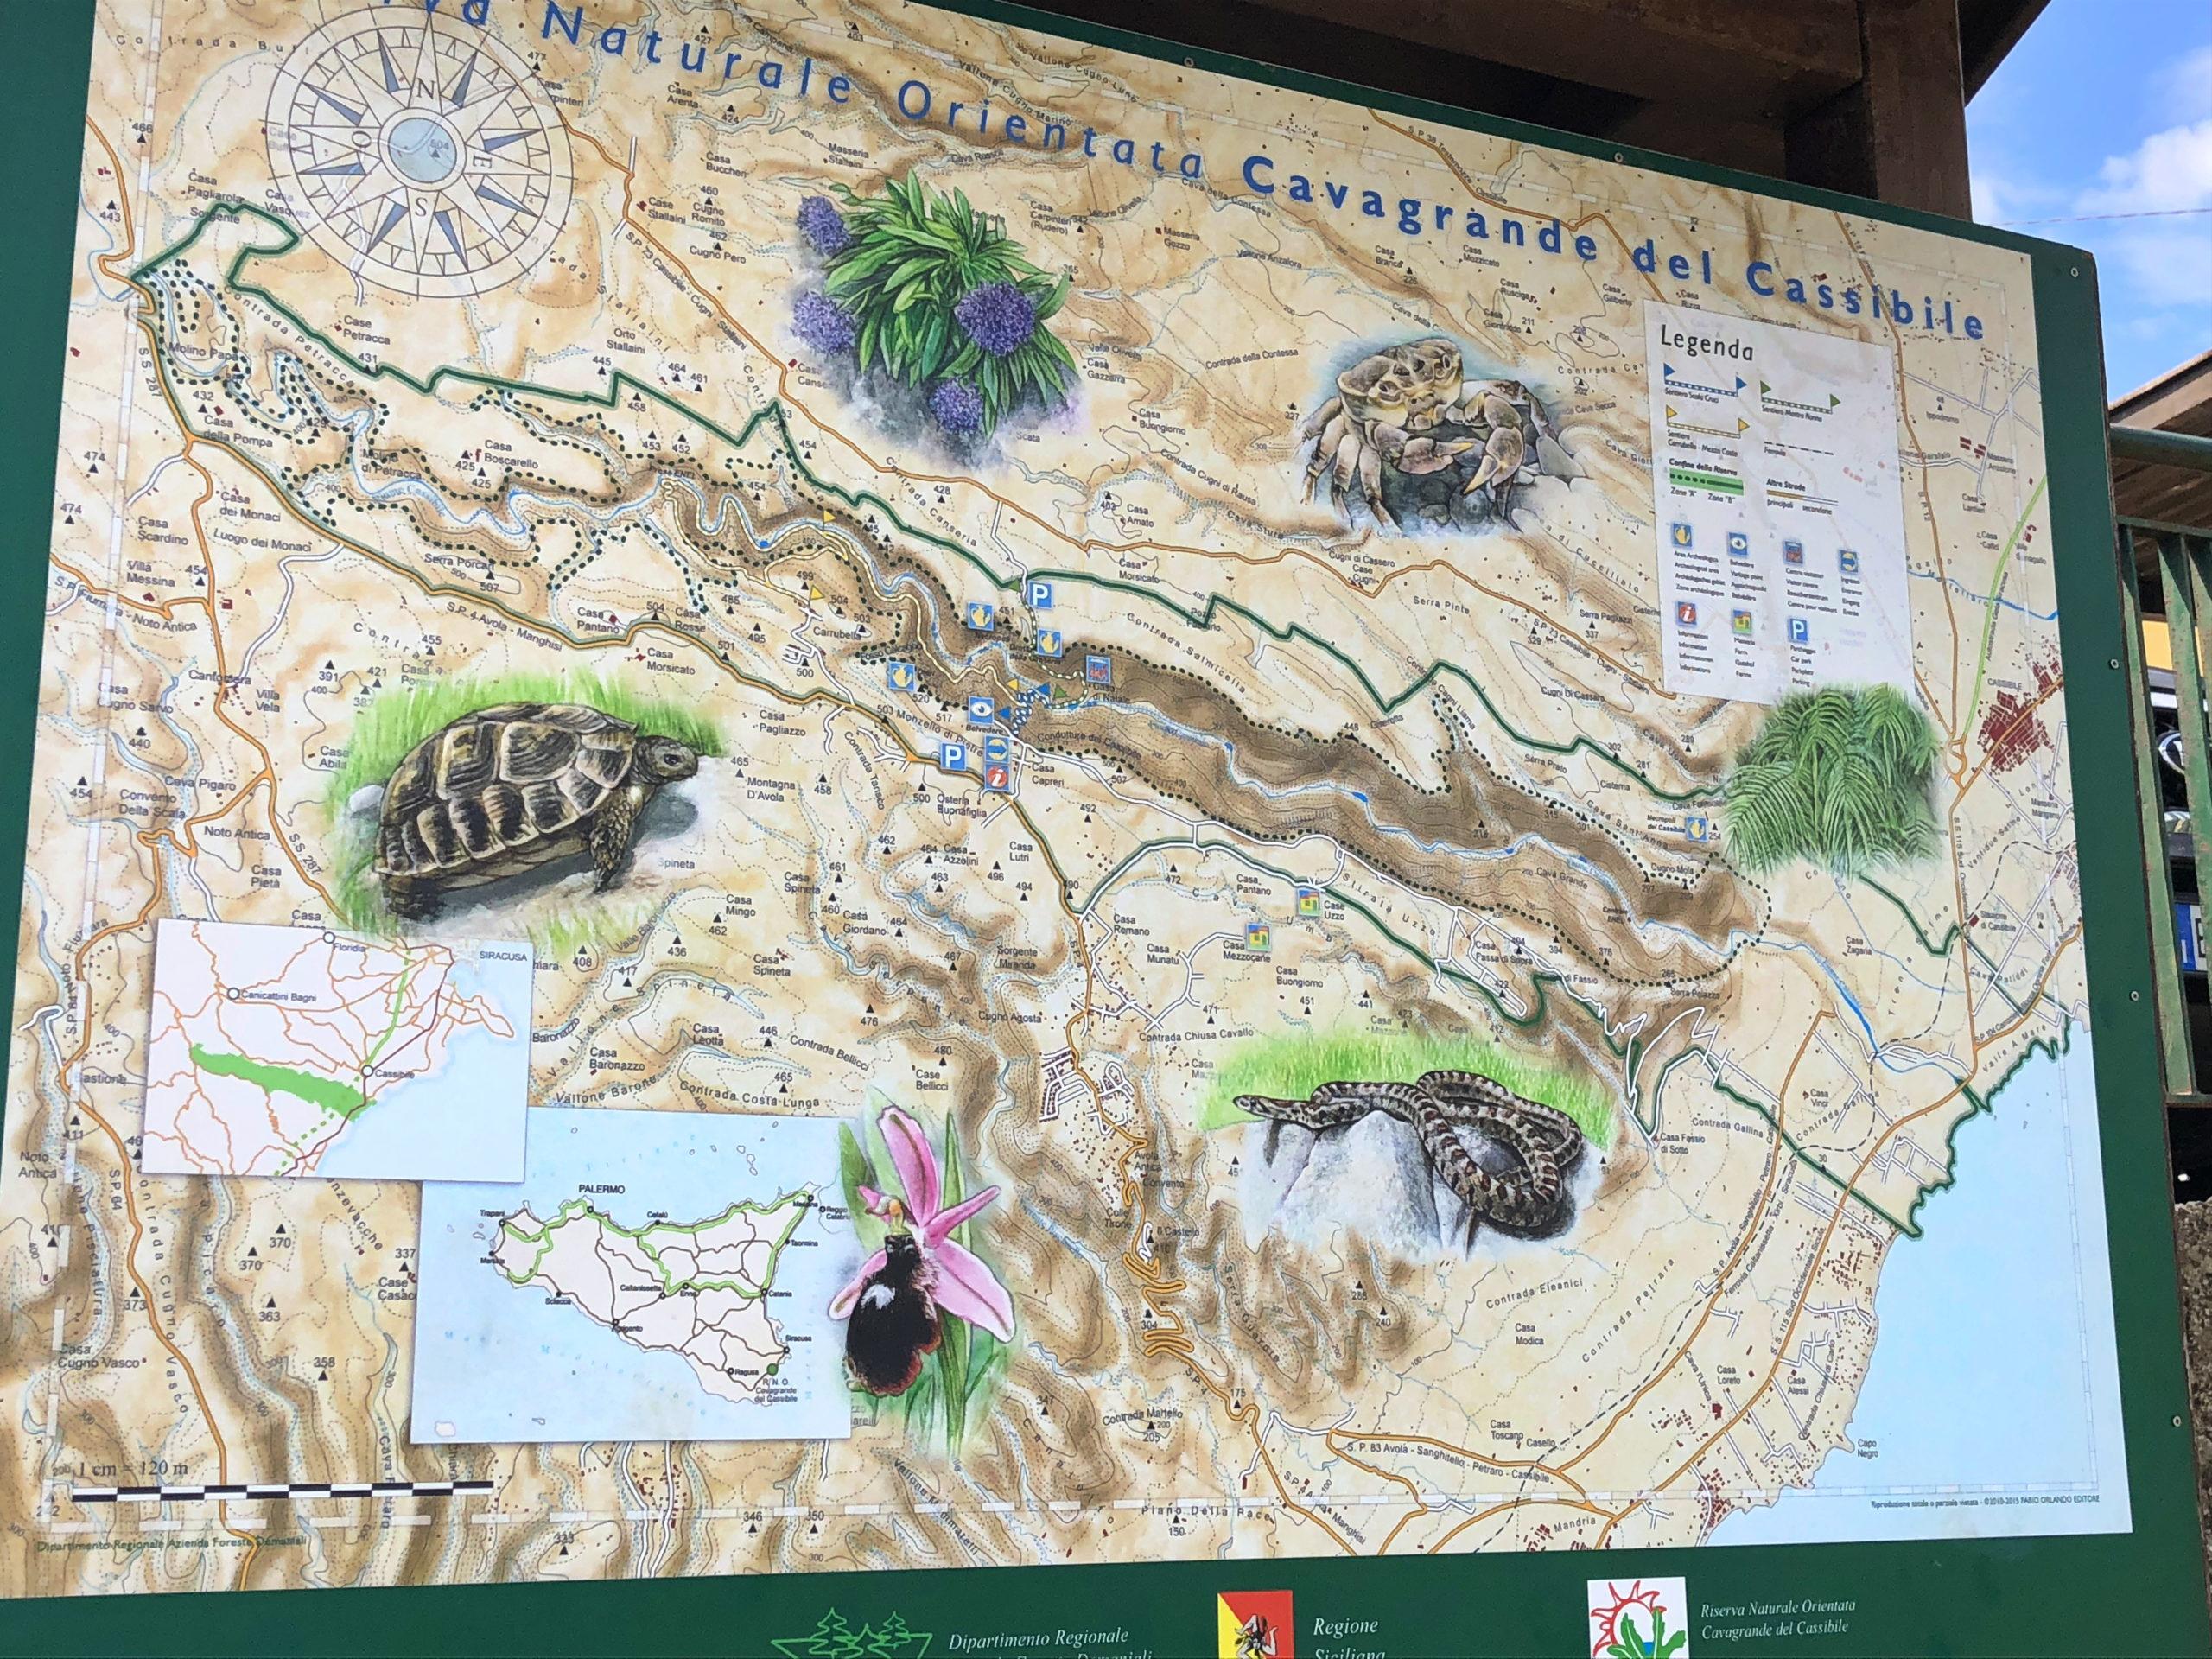 Naturschutzgebiet Cavagrande del Cassibile